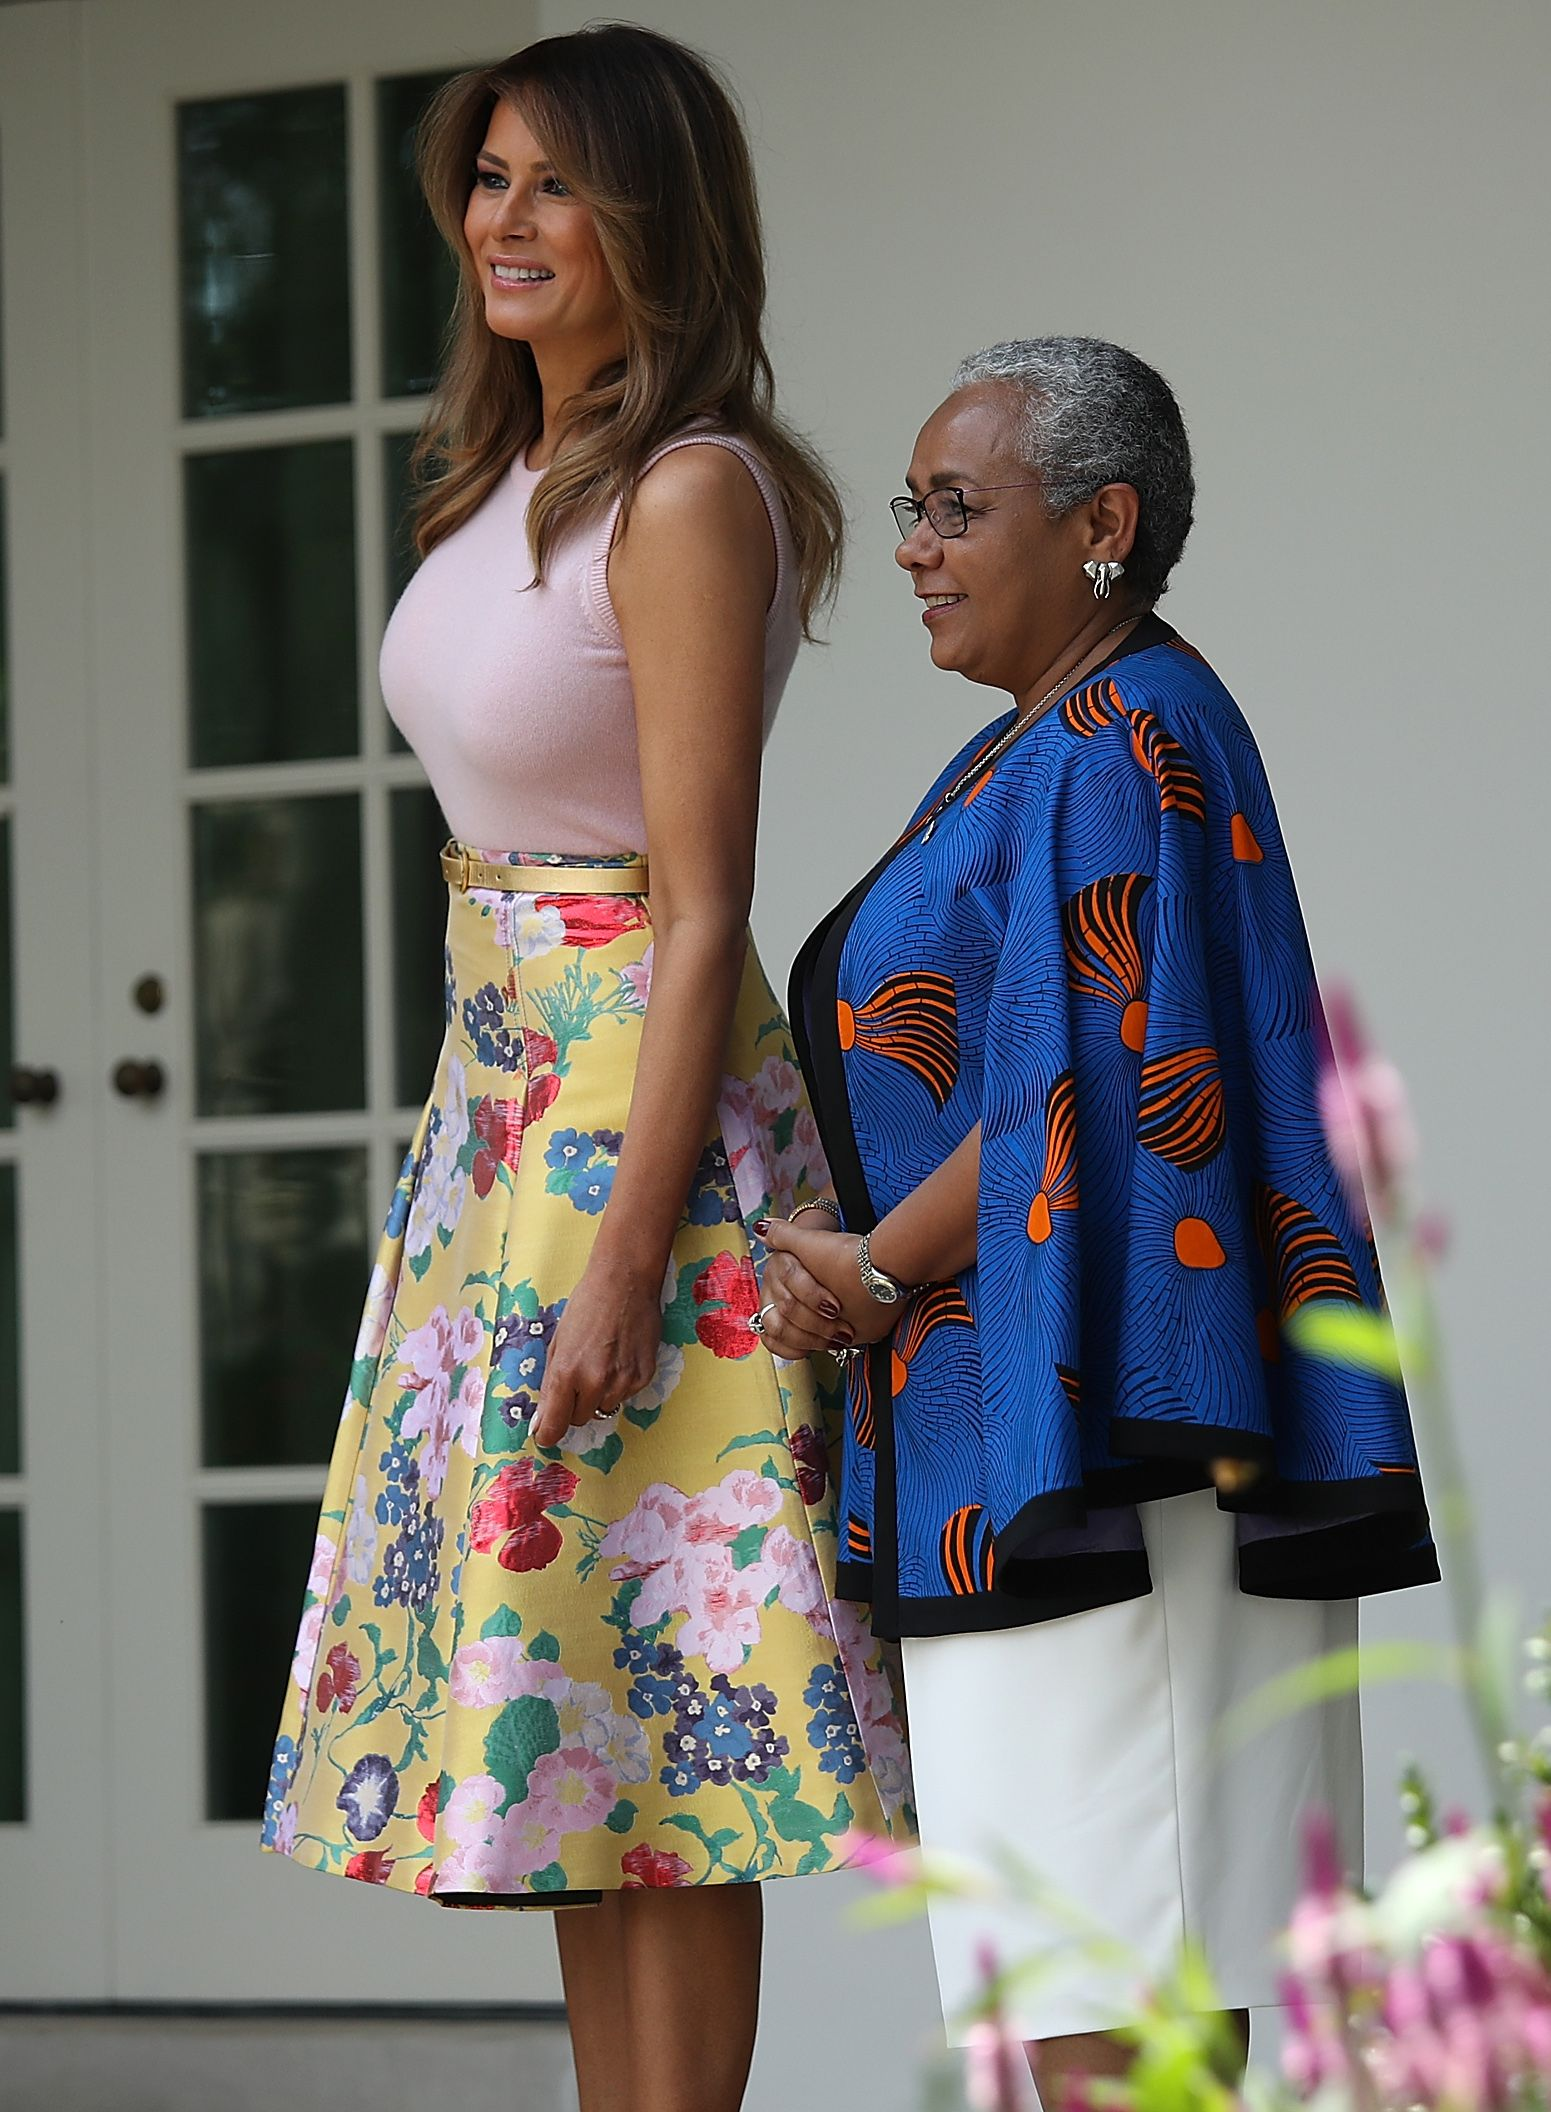 President Trump Welcomes Kenyan President Kenyatta To The White House